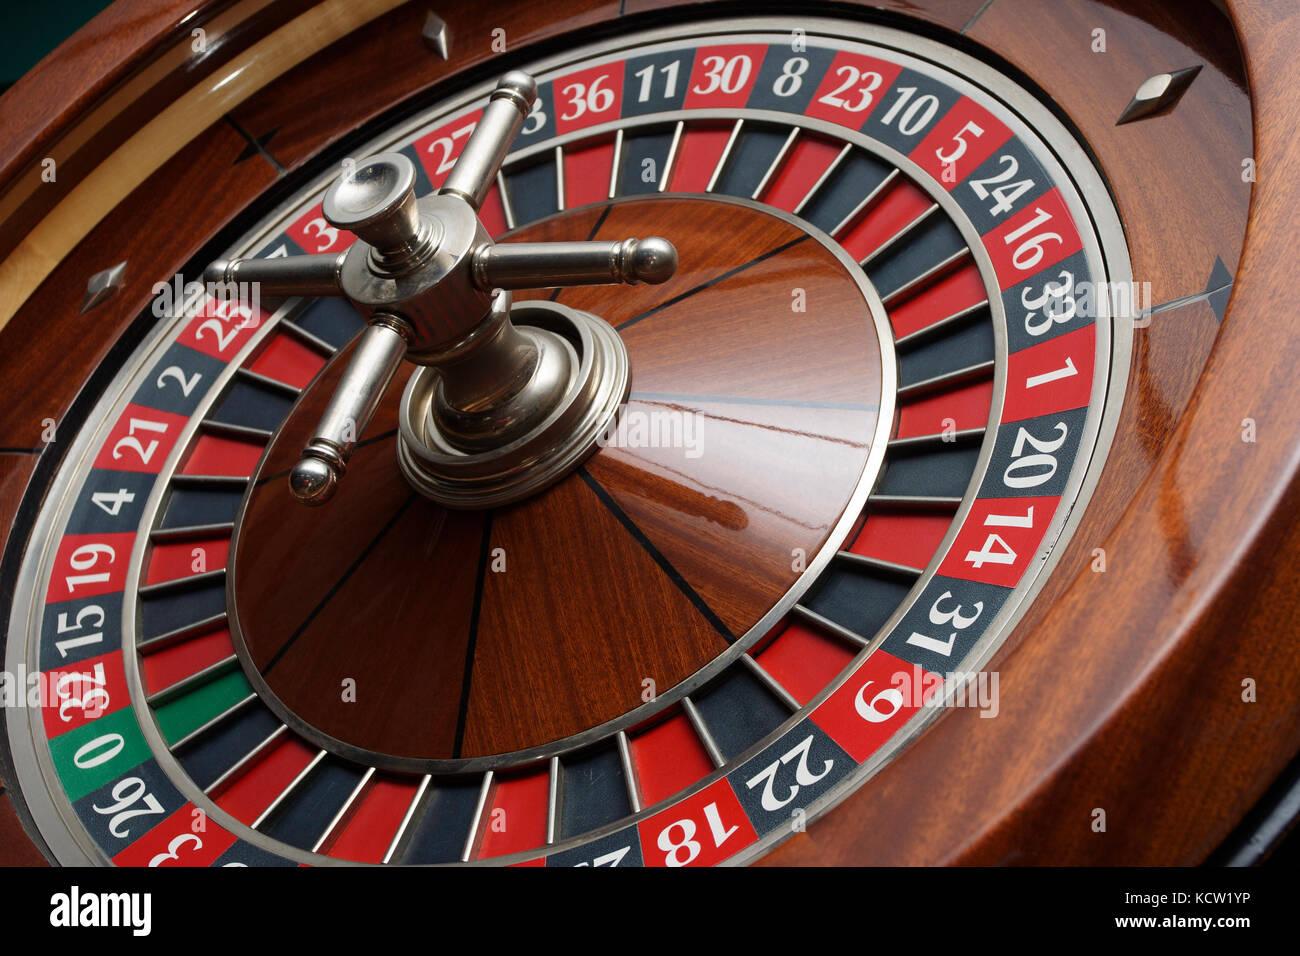 roulette wheel closeup - Stock Image